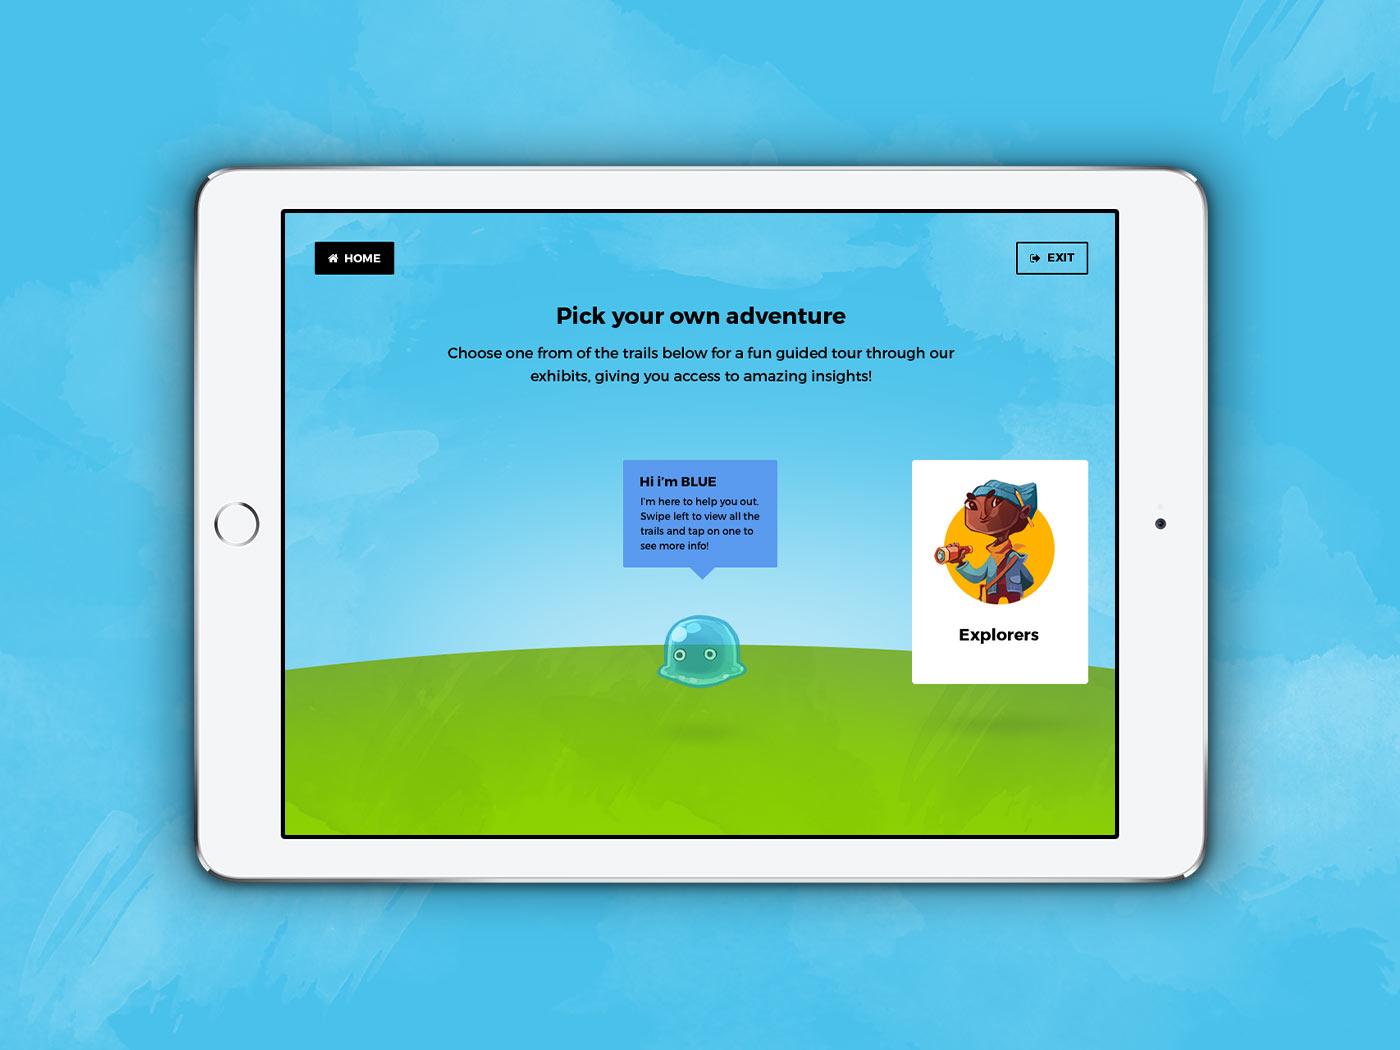 4x3-iPad-land-second-choice-1.jpg